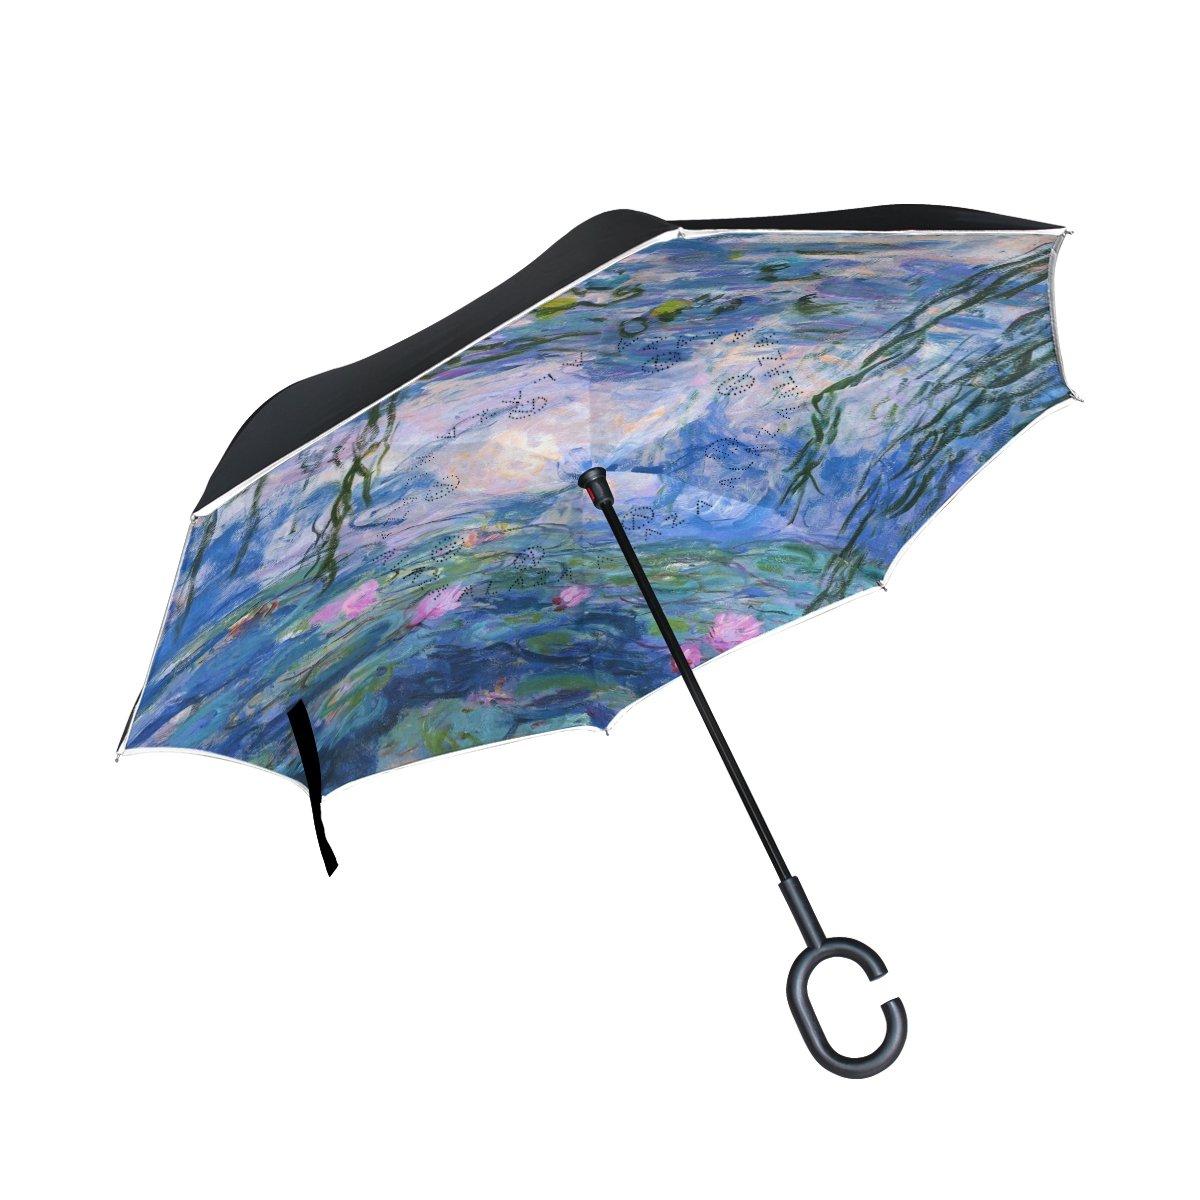 vipsk Reverse / Inverted Claude Monet Water Liliesペイント2層防水ストレート傘自立型& c-shapeハンドル&キャリーバッグforフリー、手inside-out折りたたみ車使用   B07793WMDD